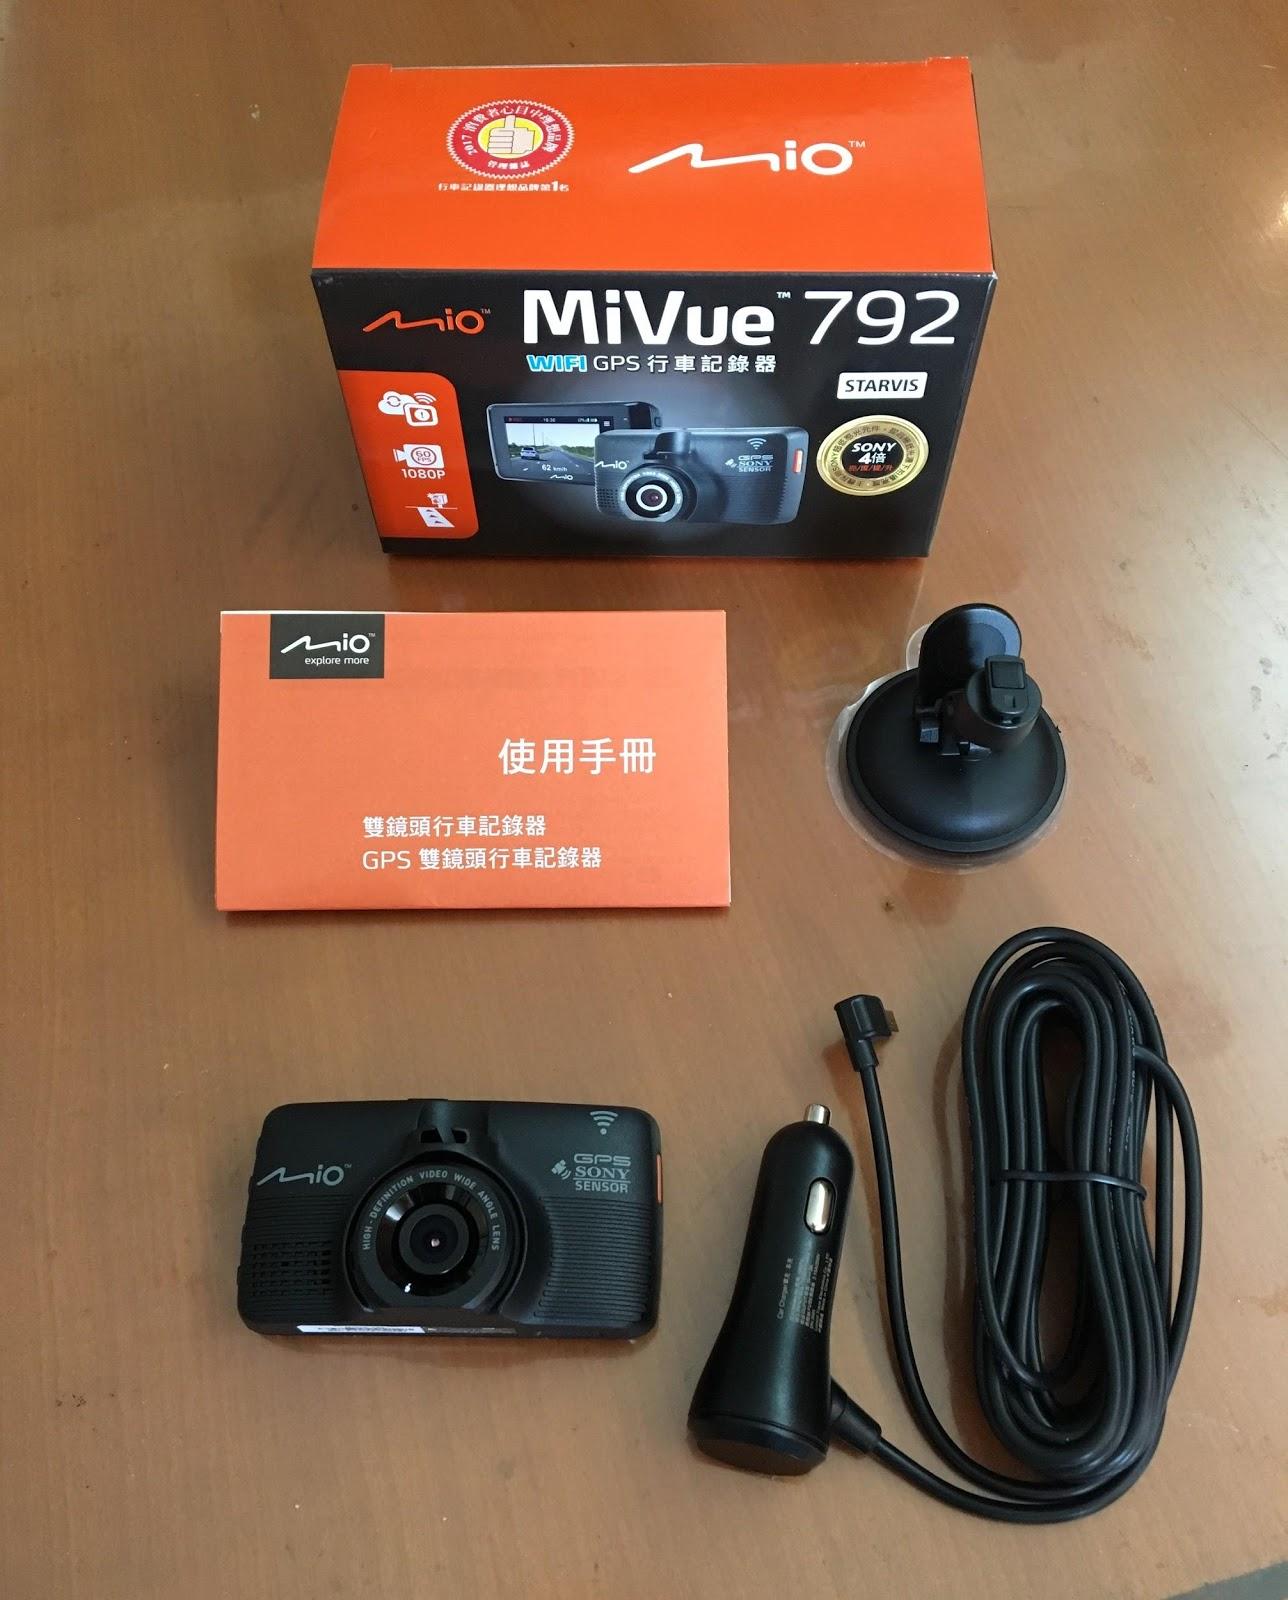 Mio MiVue 792試用心得-低光源效果驚人